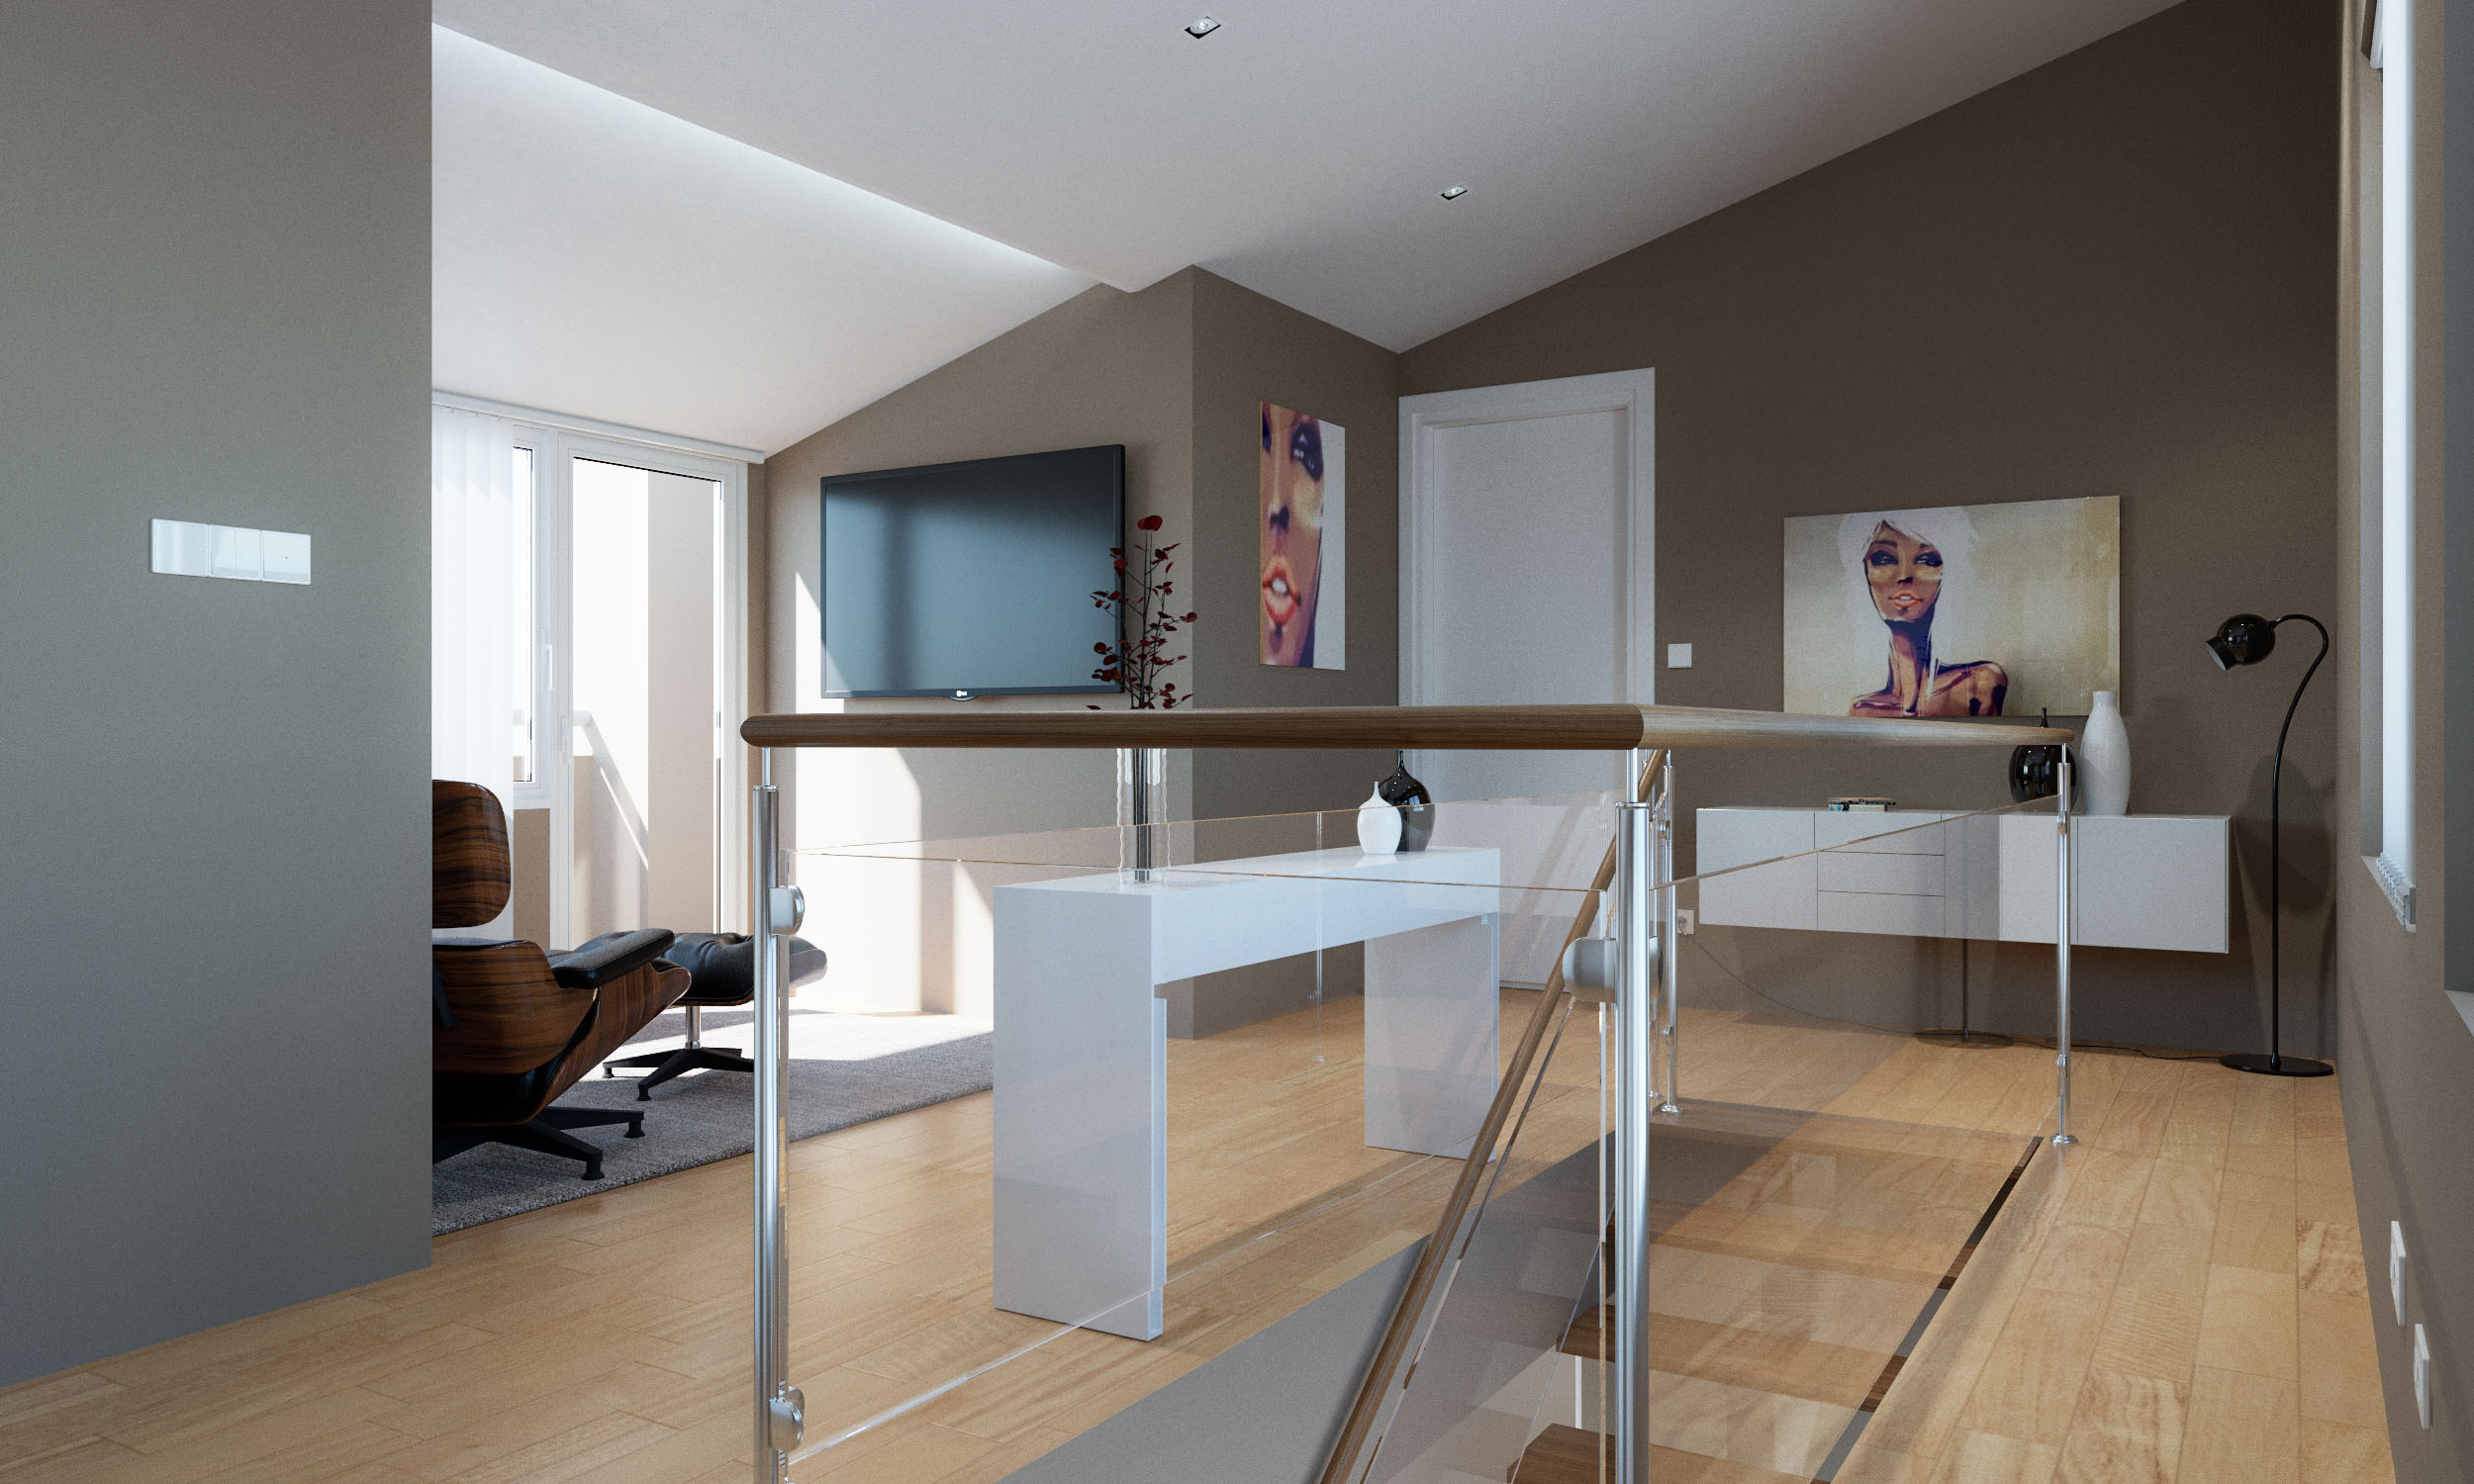 Render 3D arquitectura dúplex Donostia detalle hall piso superior